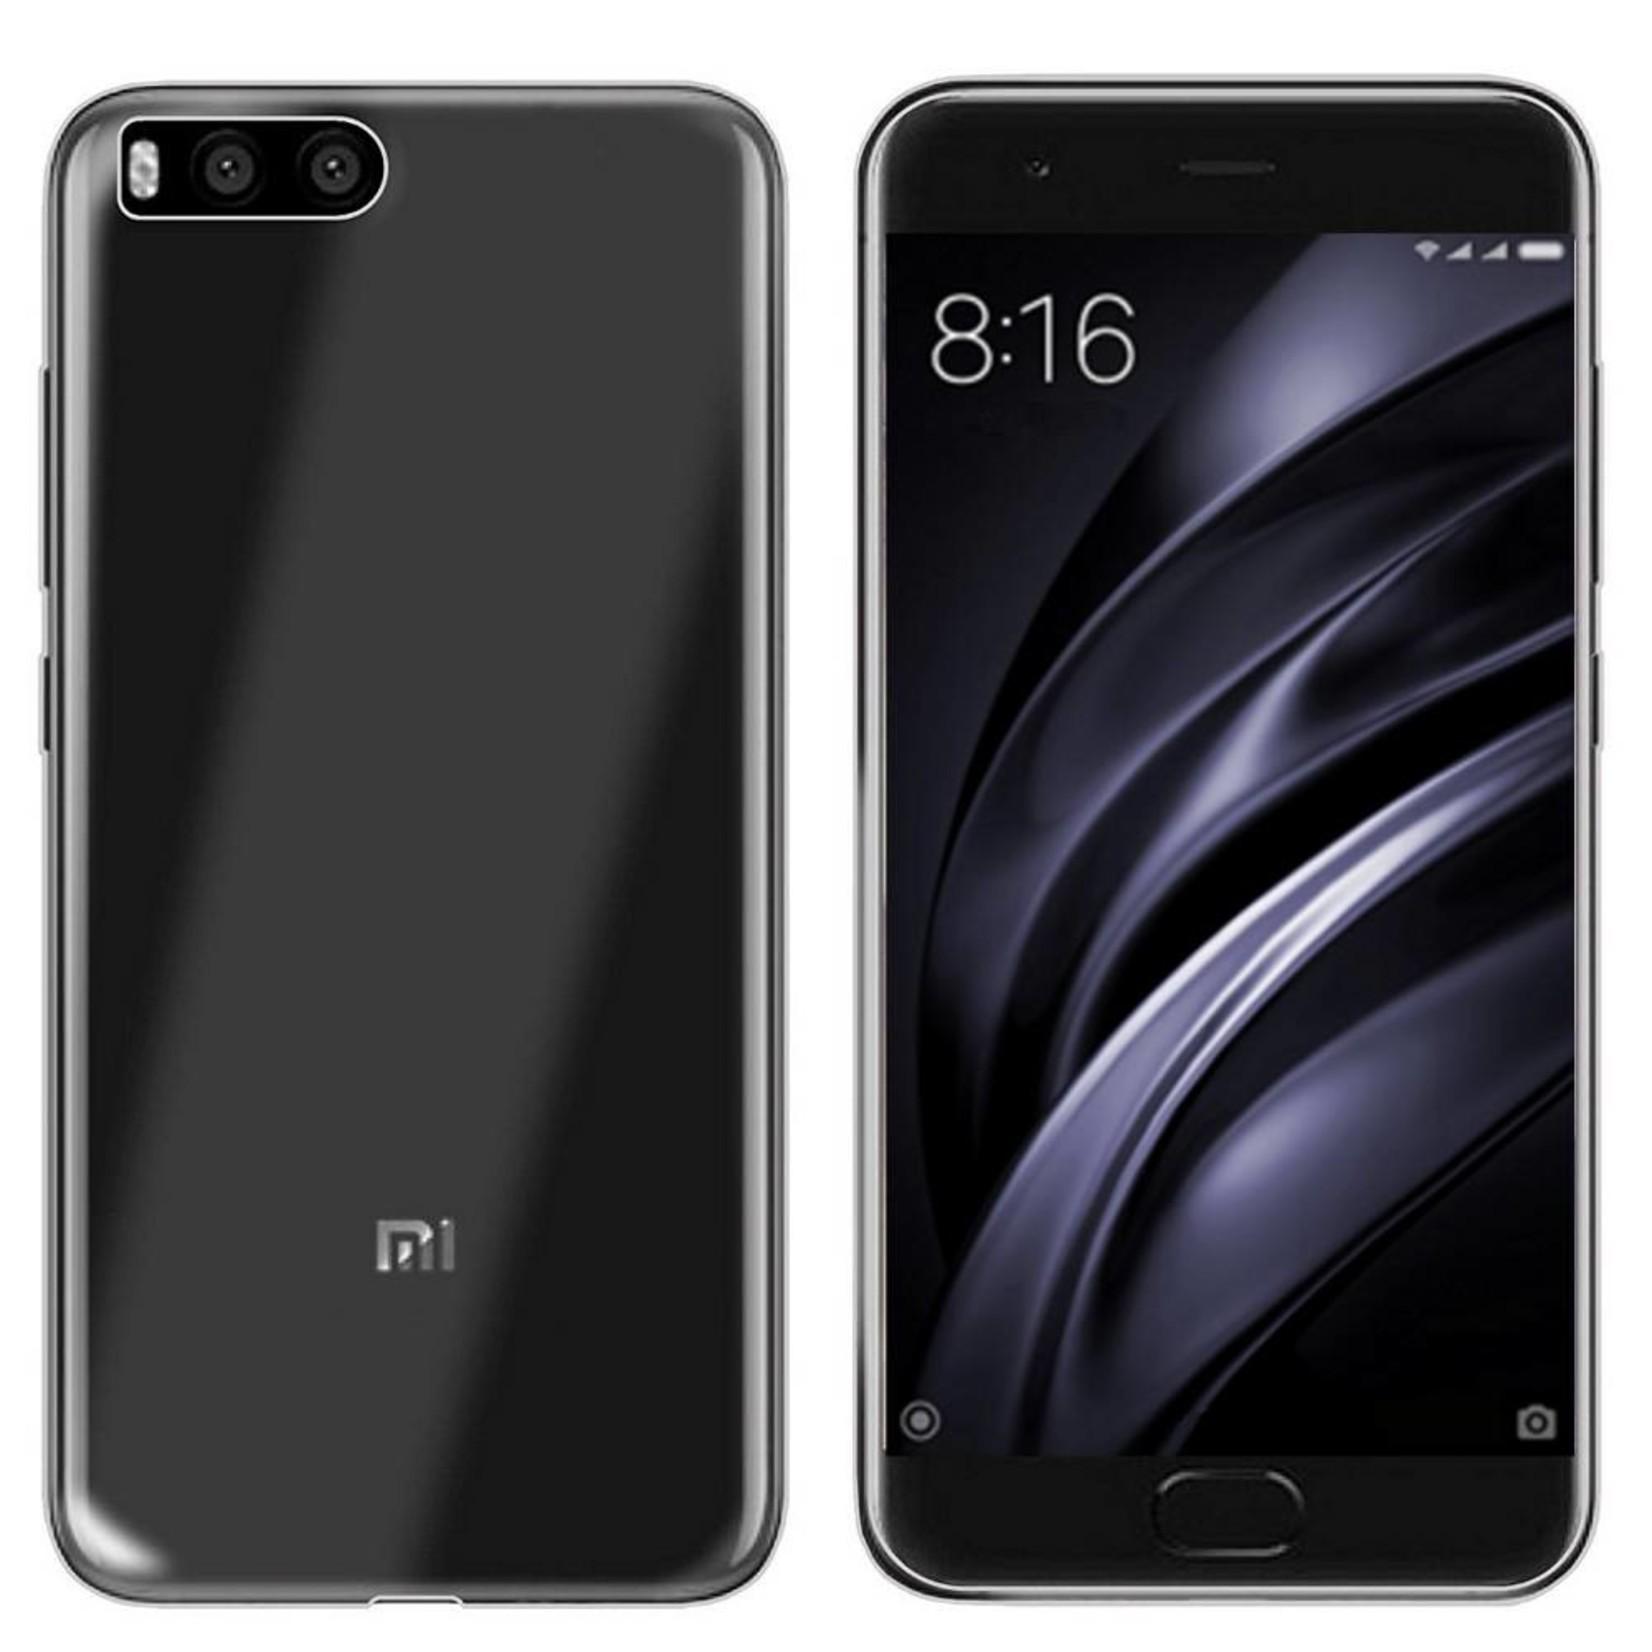 Colorfone Hoesje CoolSkin3T voor Xiaomi MI 6 Transparant Wit